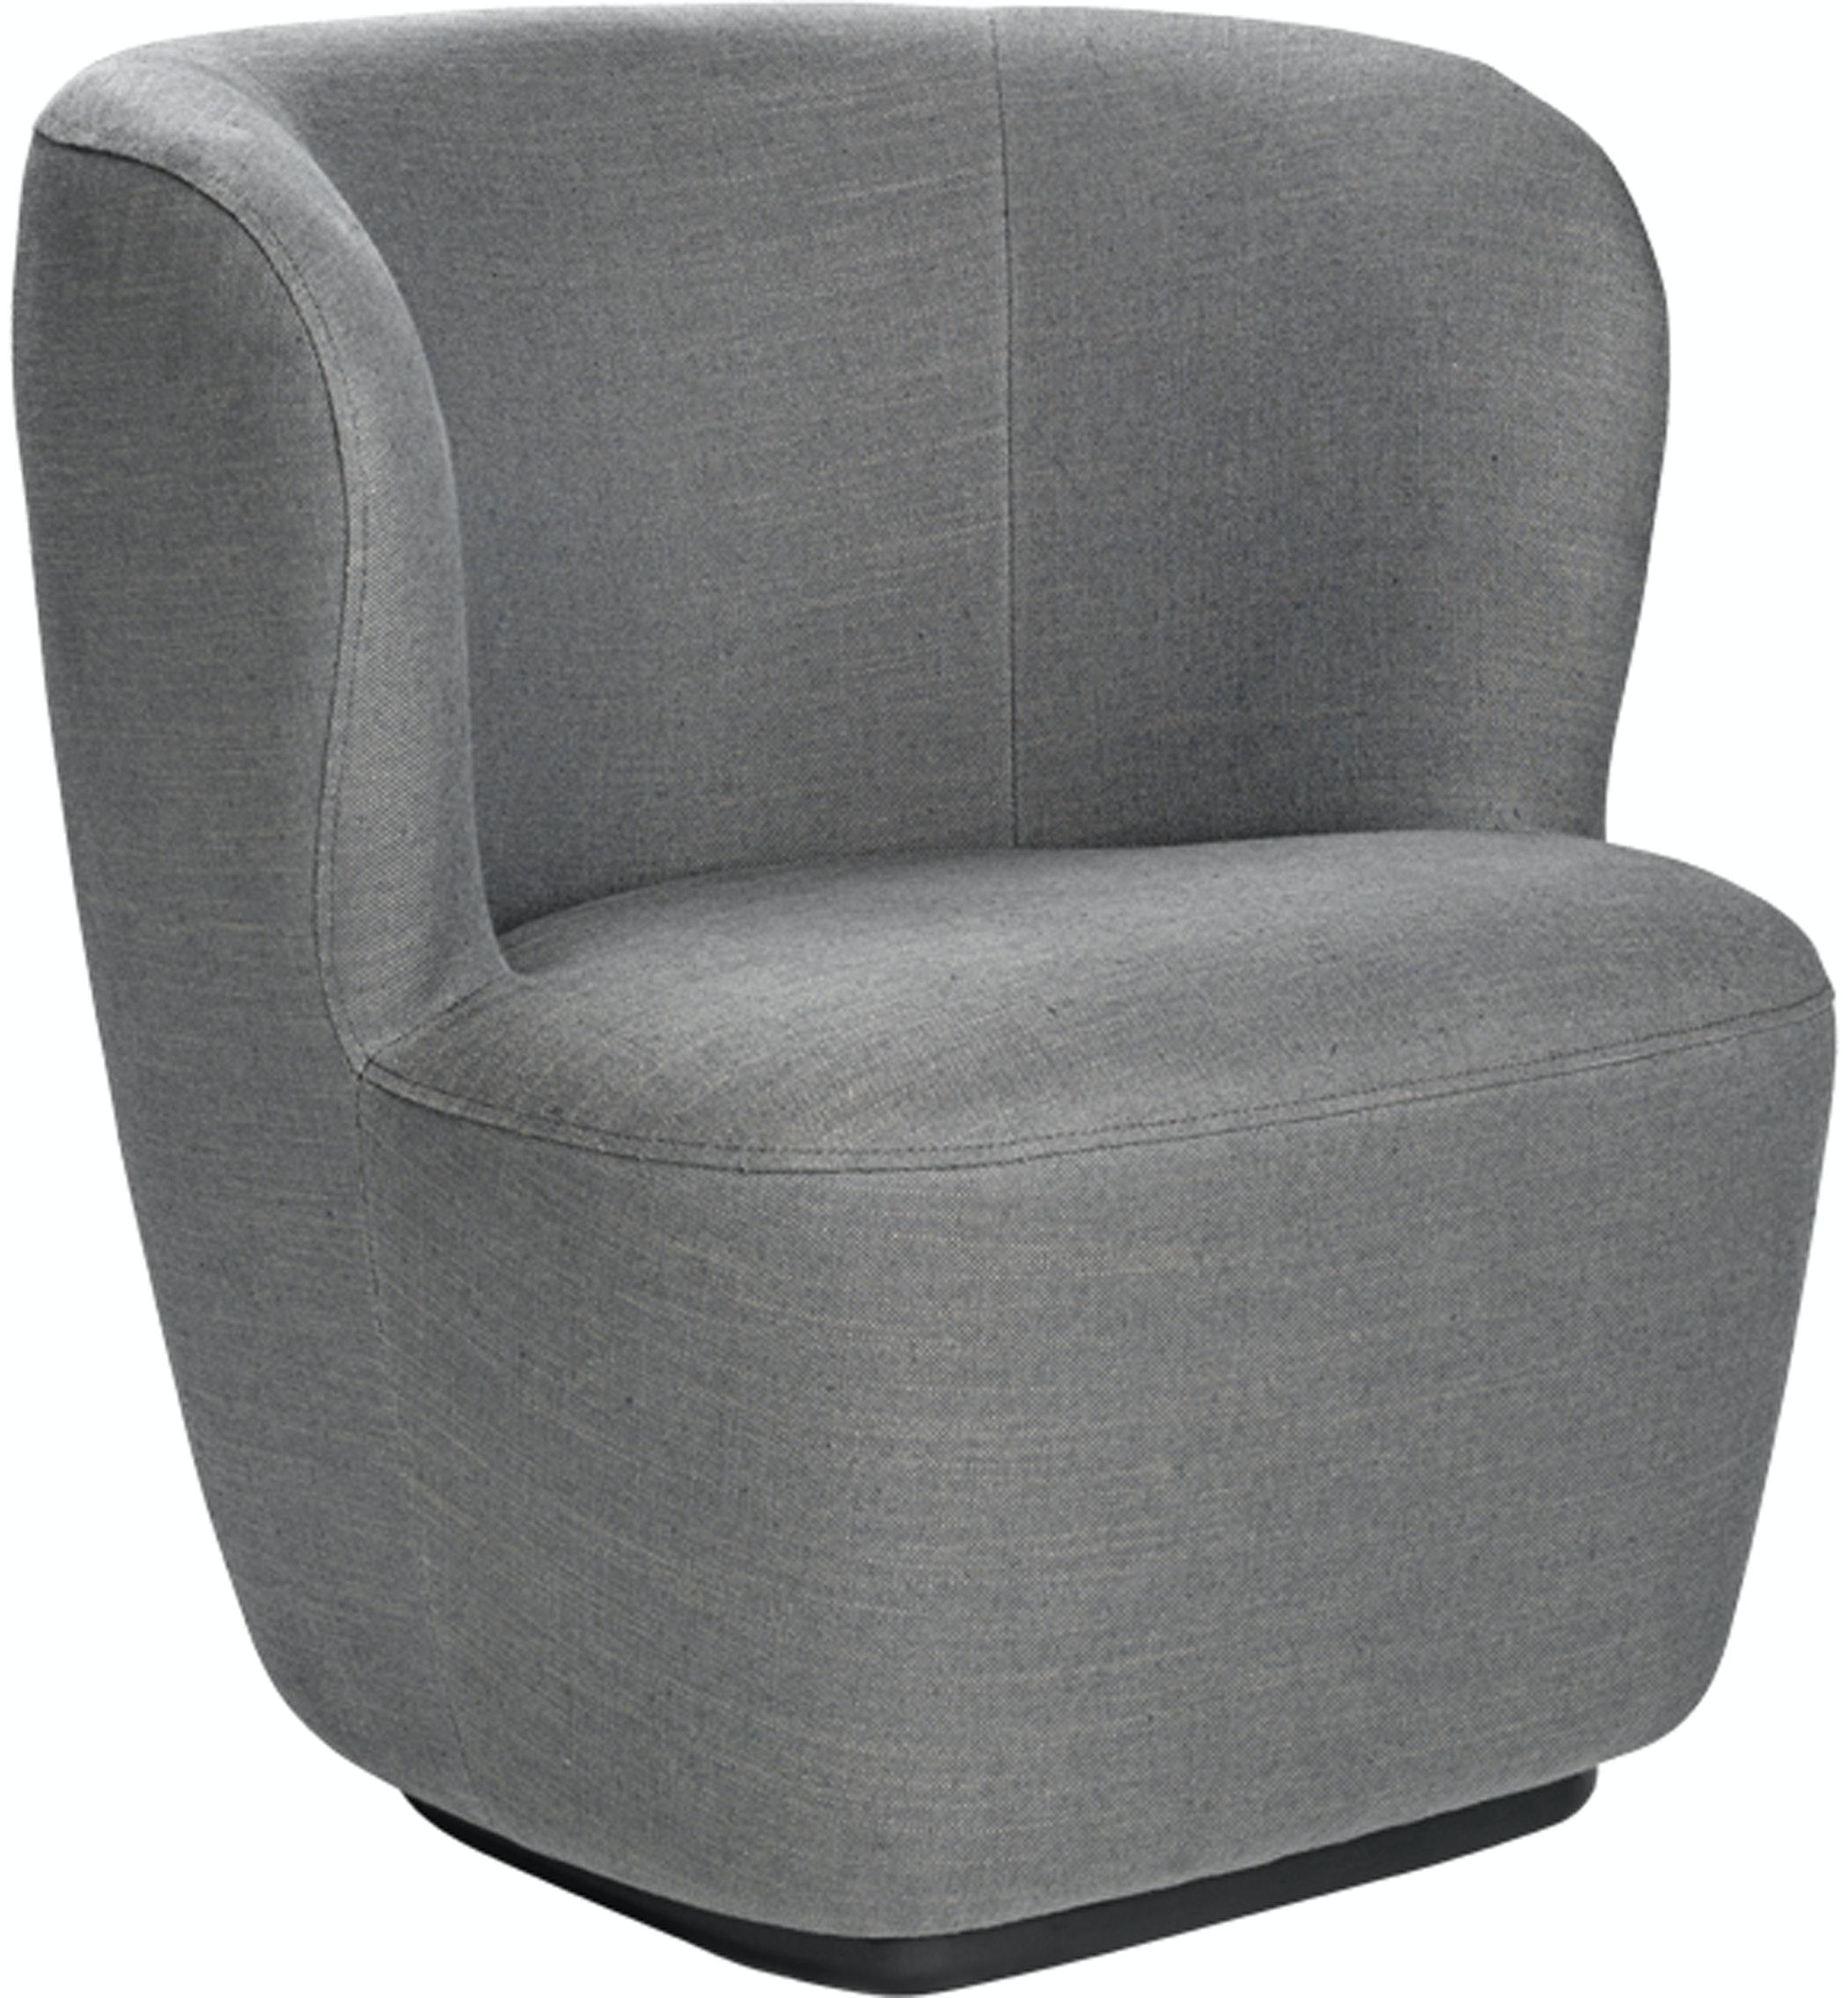 Stay Loungechair 75 Swivel Chambray 030 Angle Image